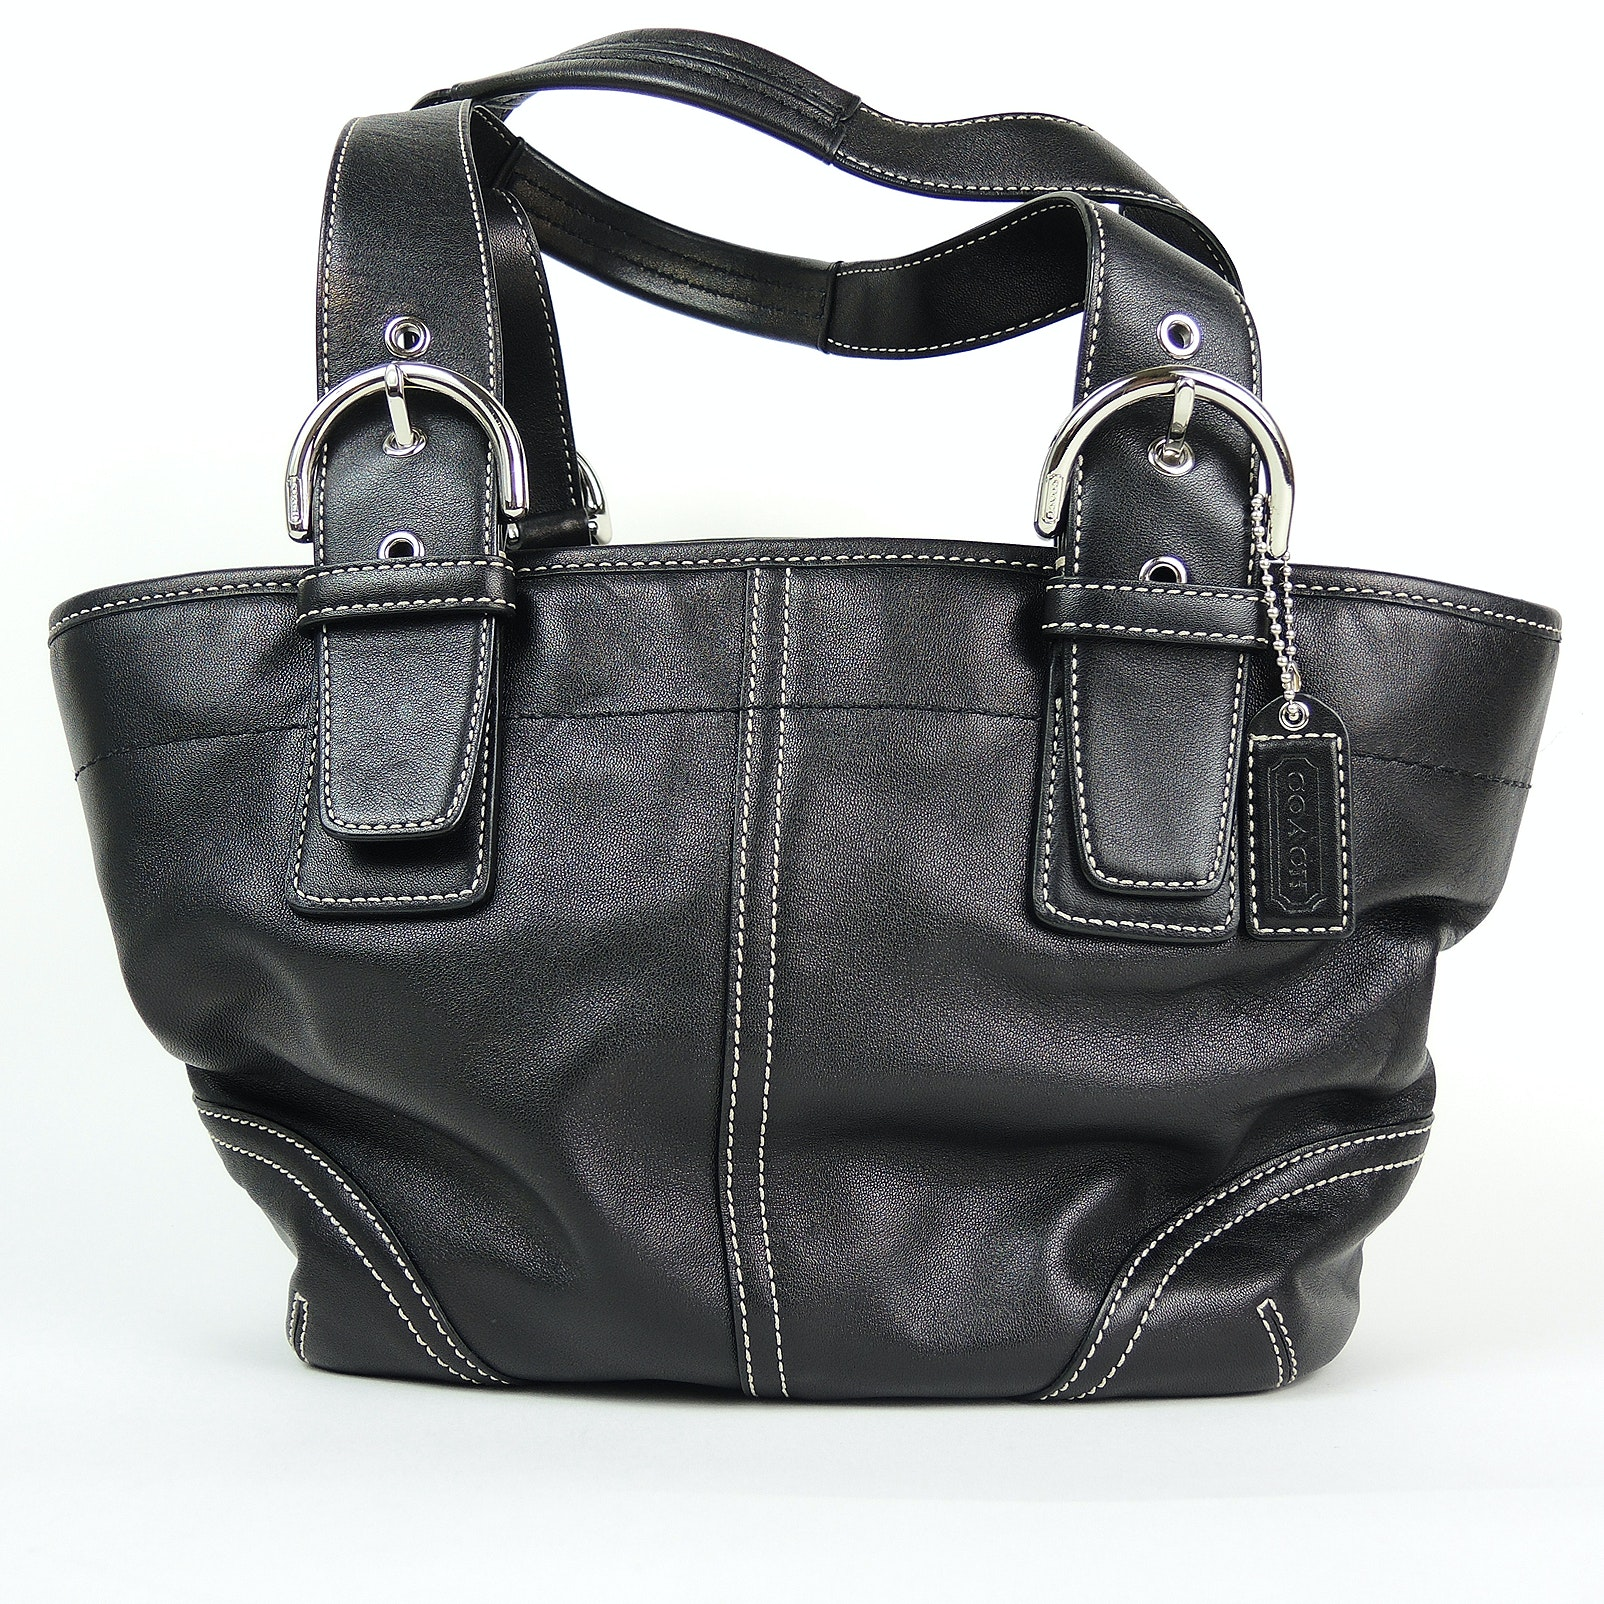 Coach Soho Black Leather Tote Bag